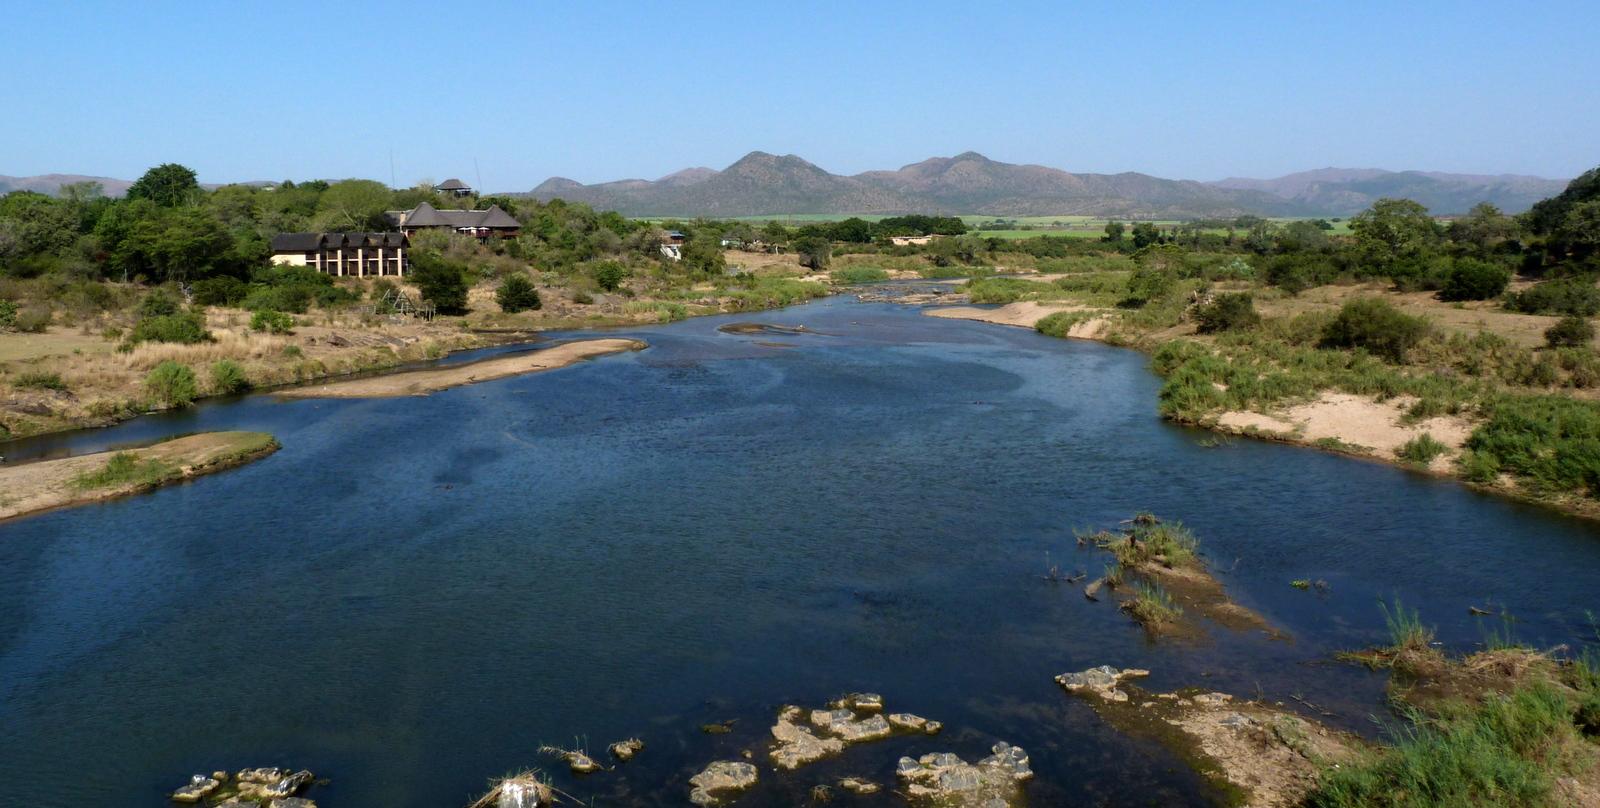 Südafrika und Swasiland Overland. suedafrika staedtereisen sonne safari afrika  P1090485